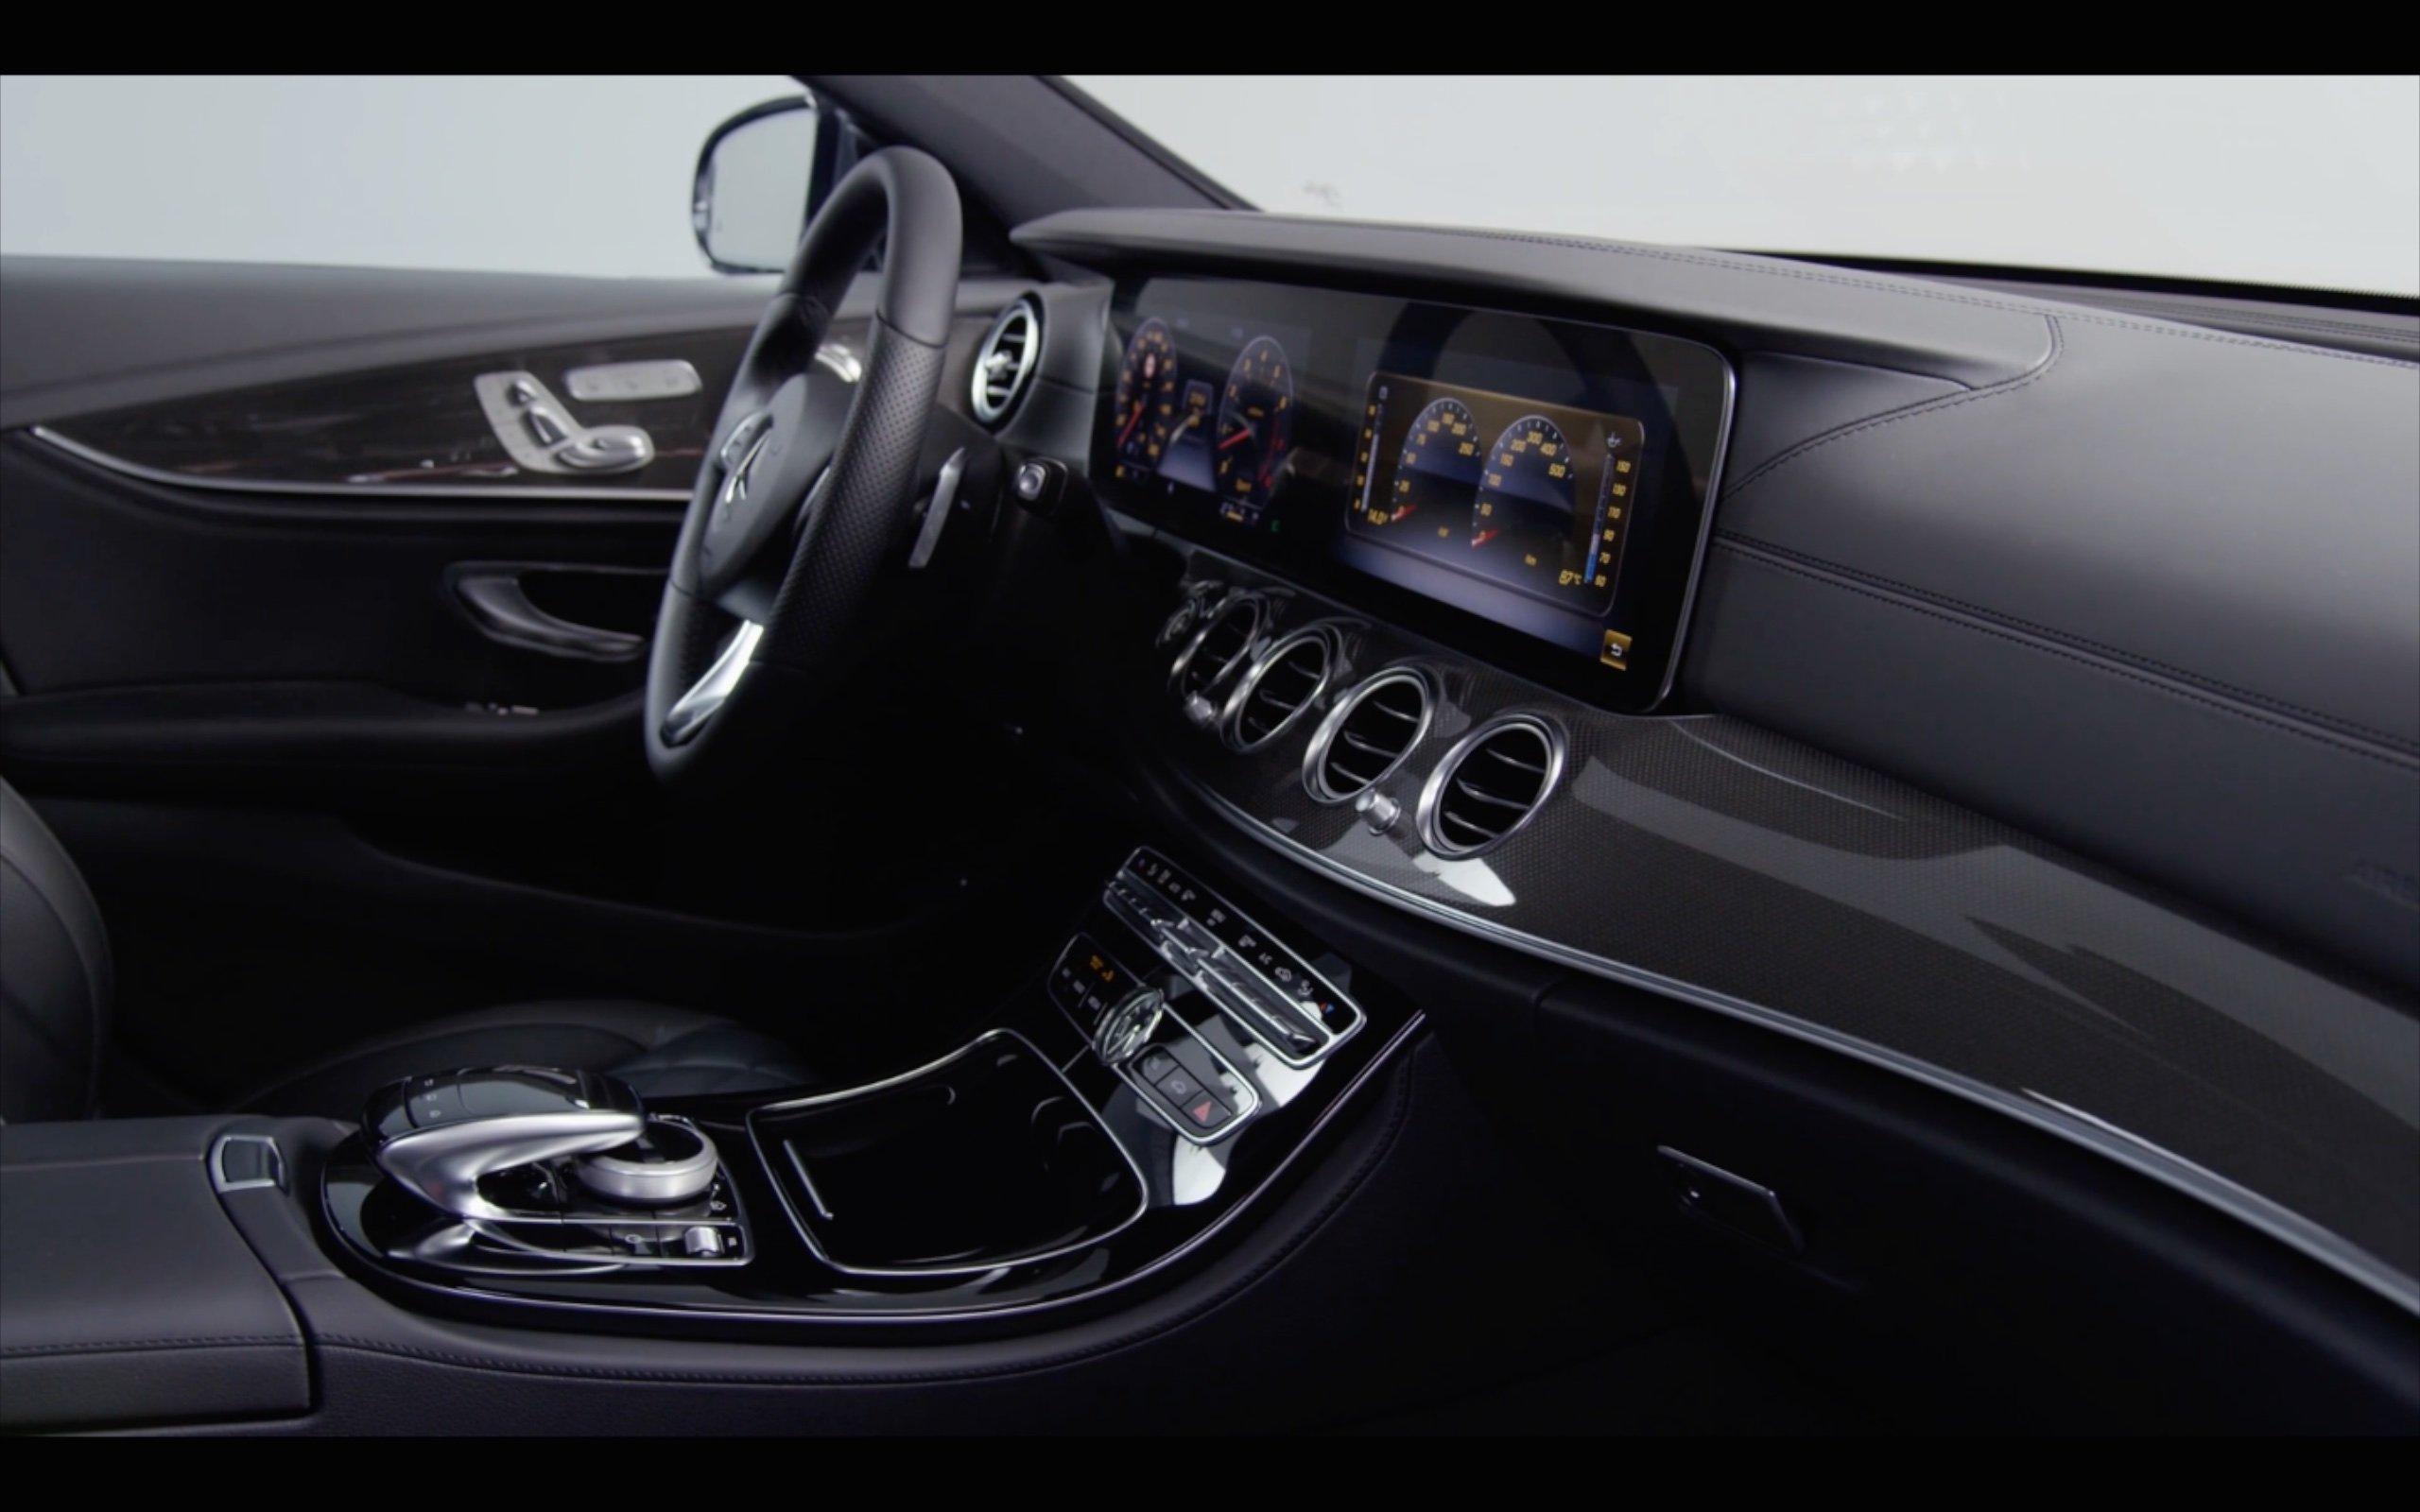 Video w213 mercedes benz e class interior detailed image for Mercedes benz e350 interior